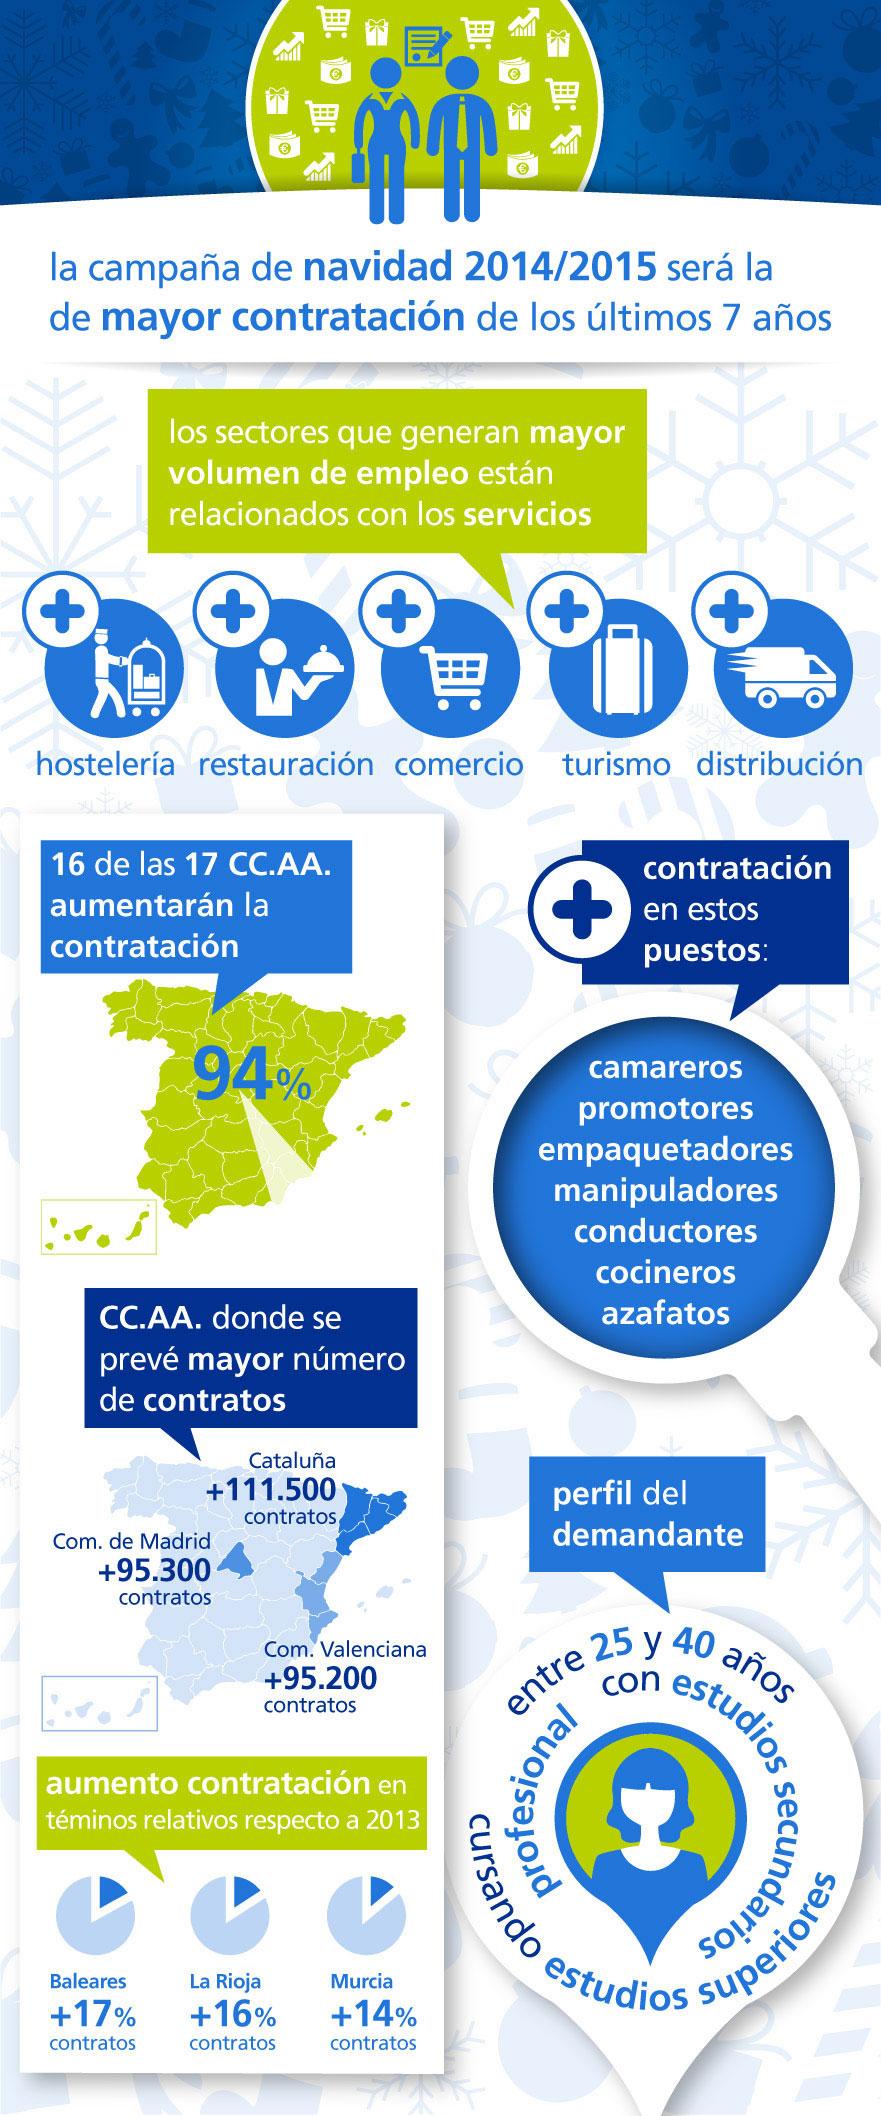 infografia-emailing-navidad-2014.jpg